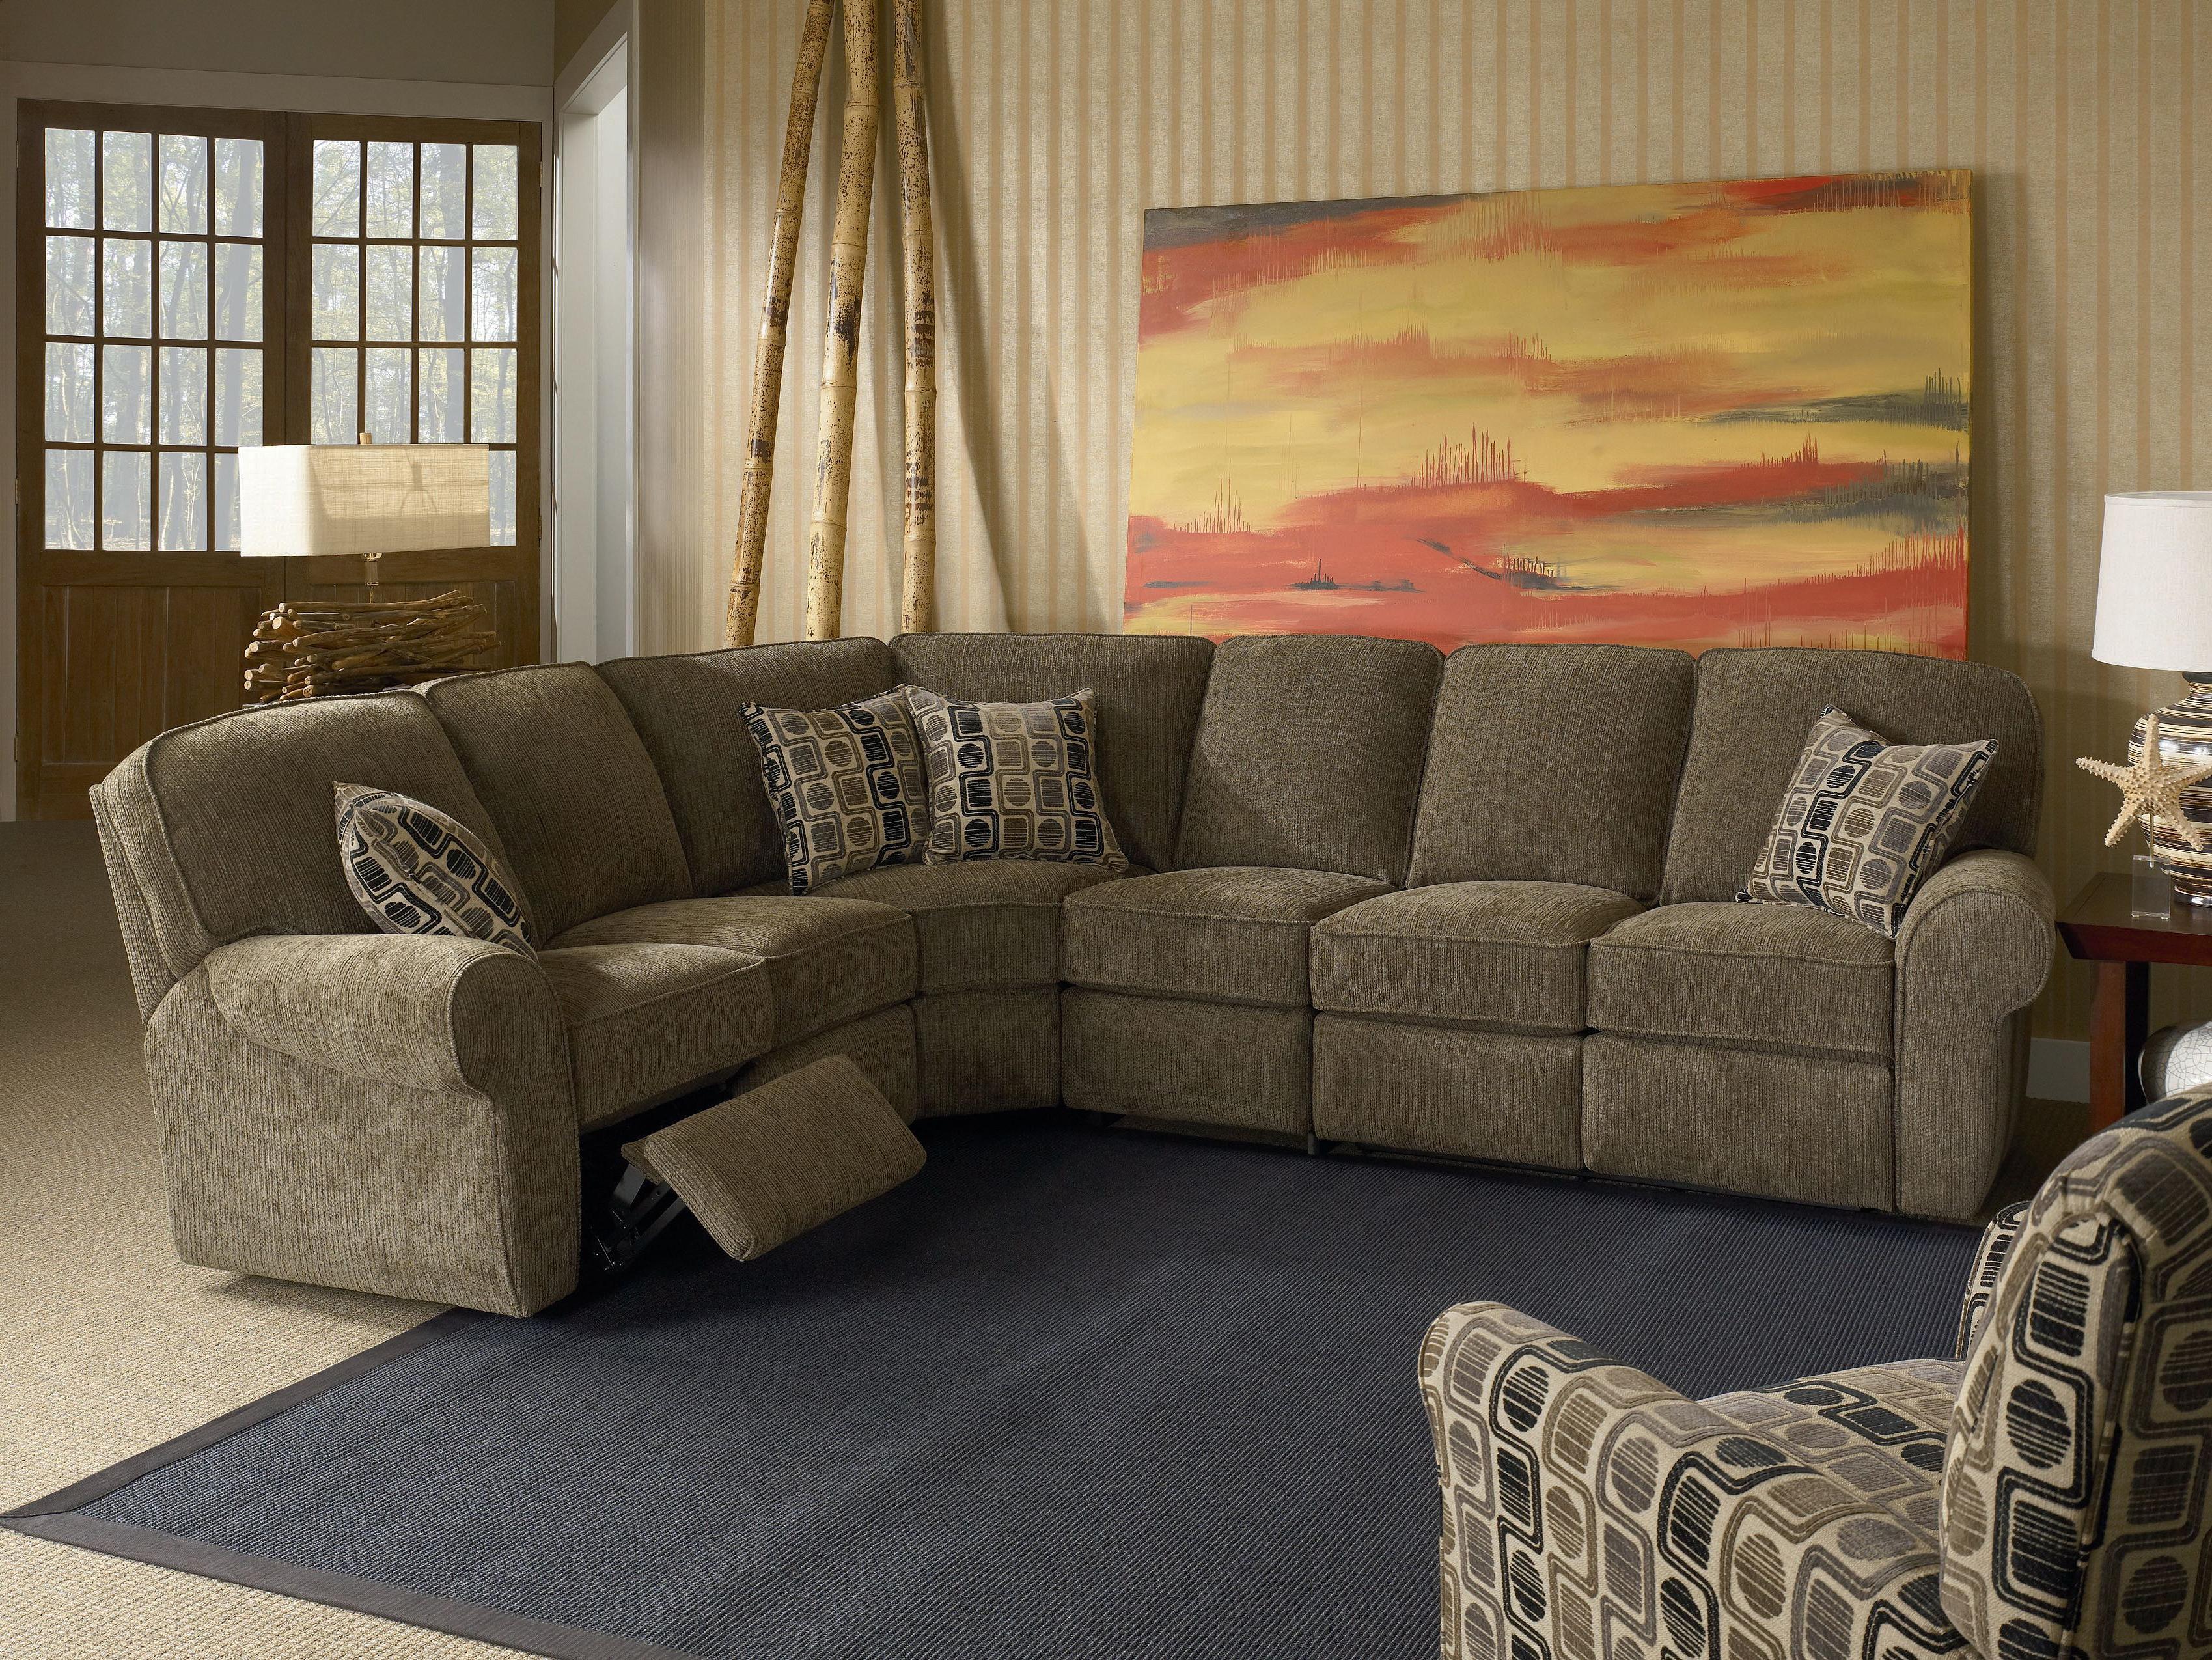 Lane Megan Powerized 4 Piece Sectional Sofa